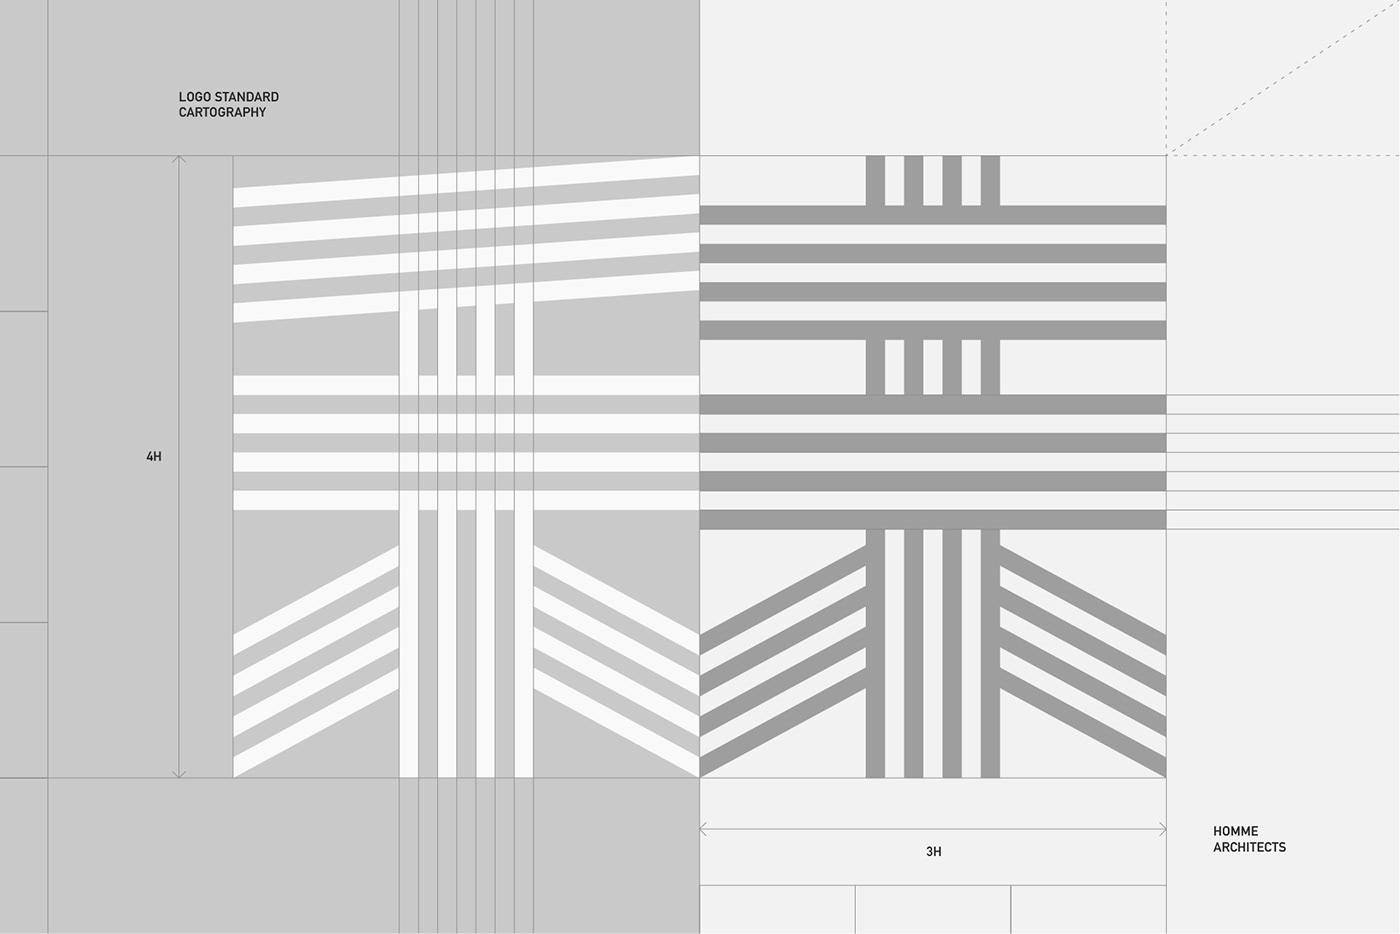 architect architecture branding  building identity Interior logo Minimalism Stationery visual